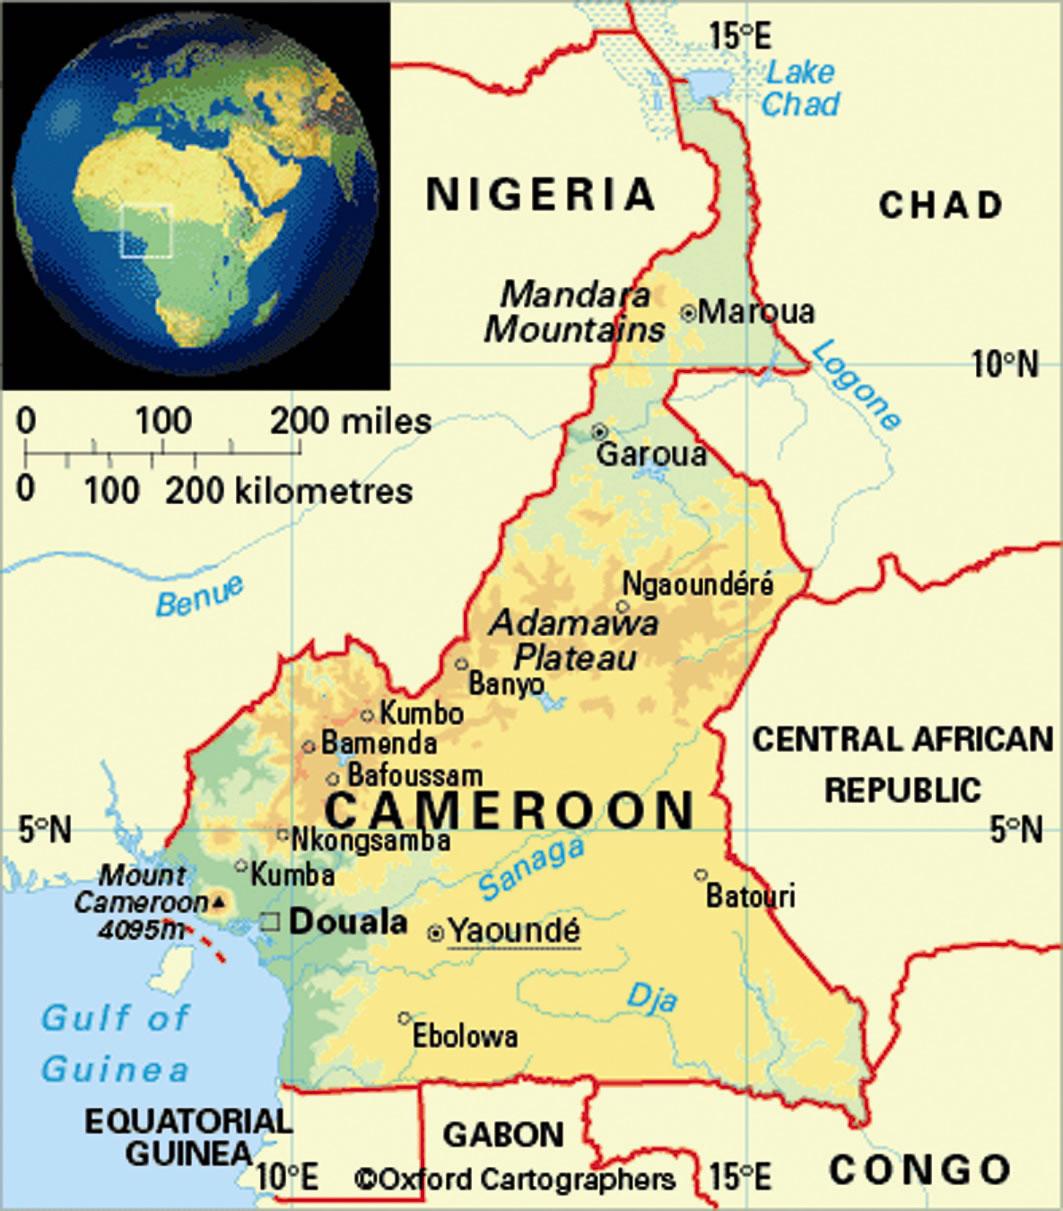 Jeff Heidi Cecil Cameroon Africa